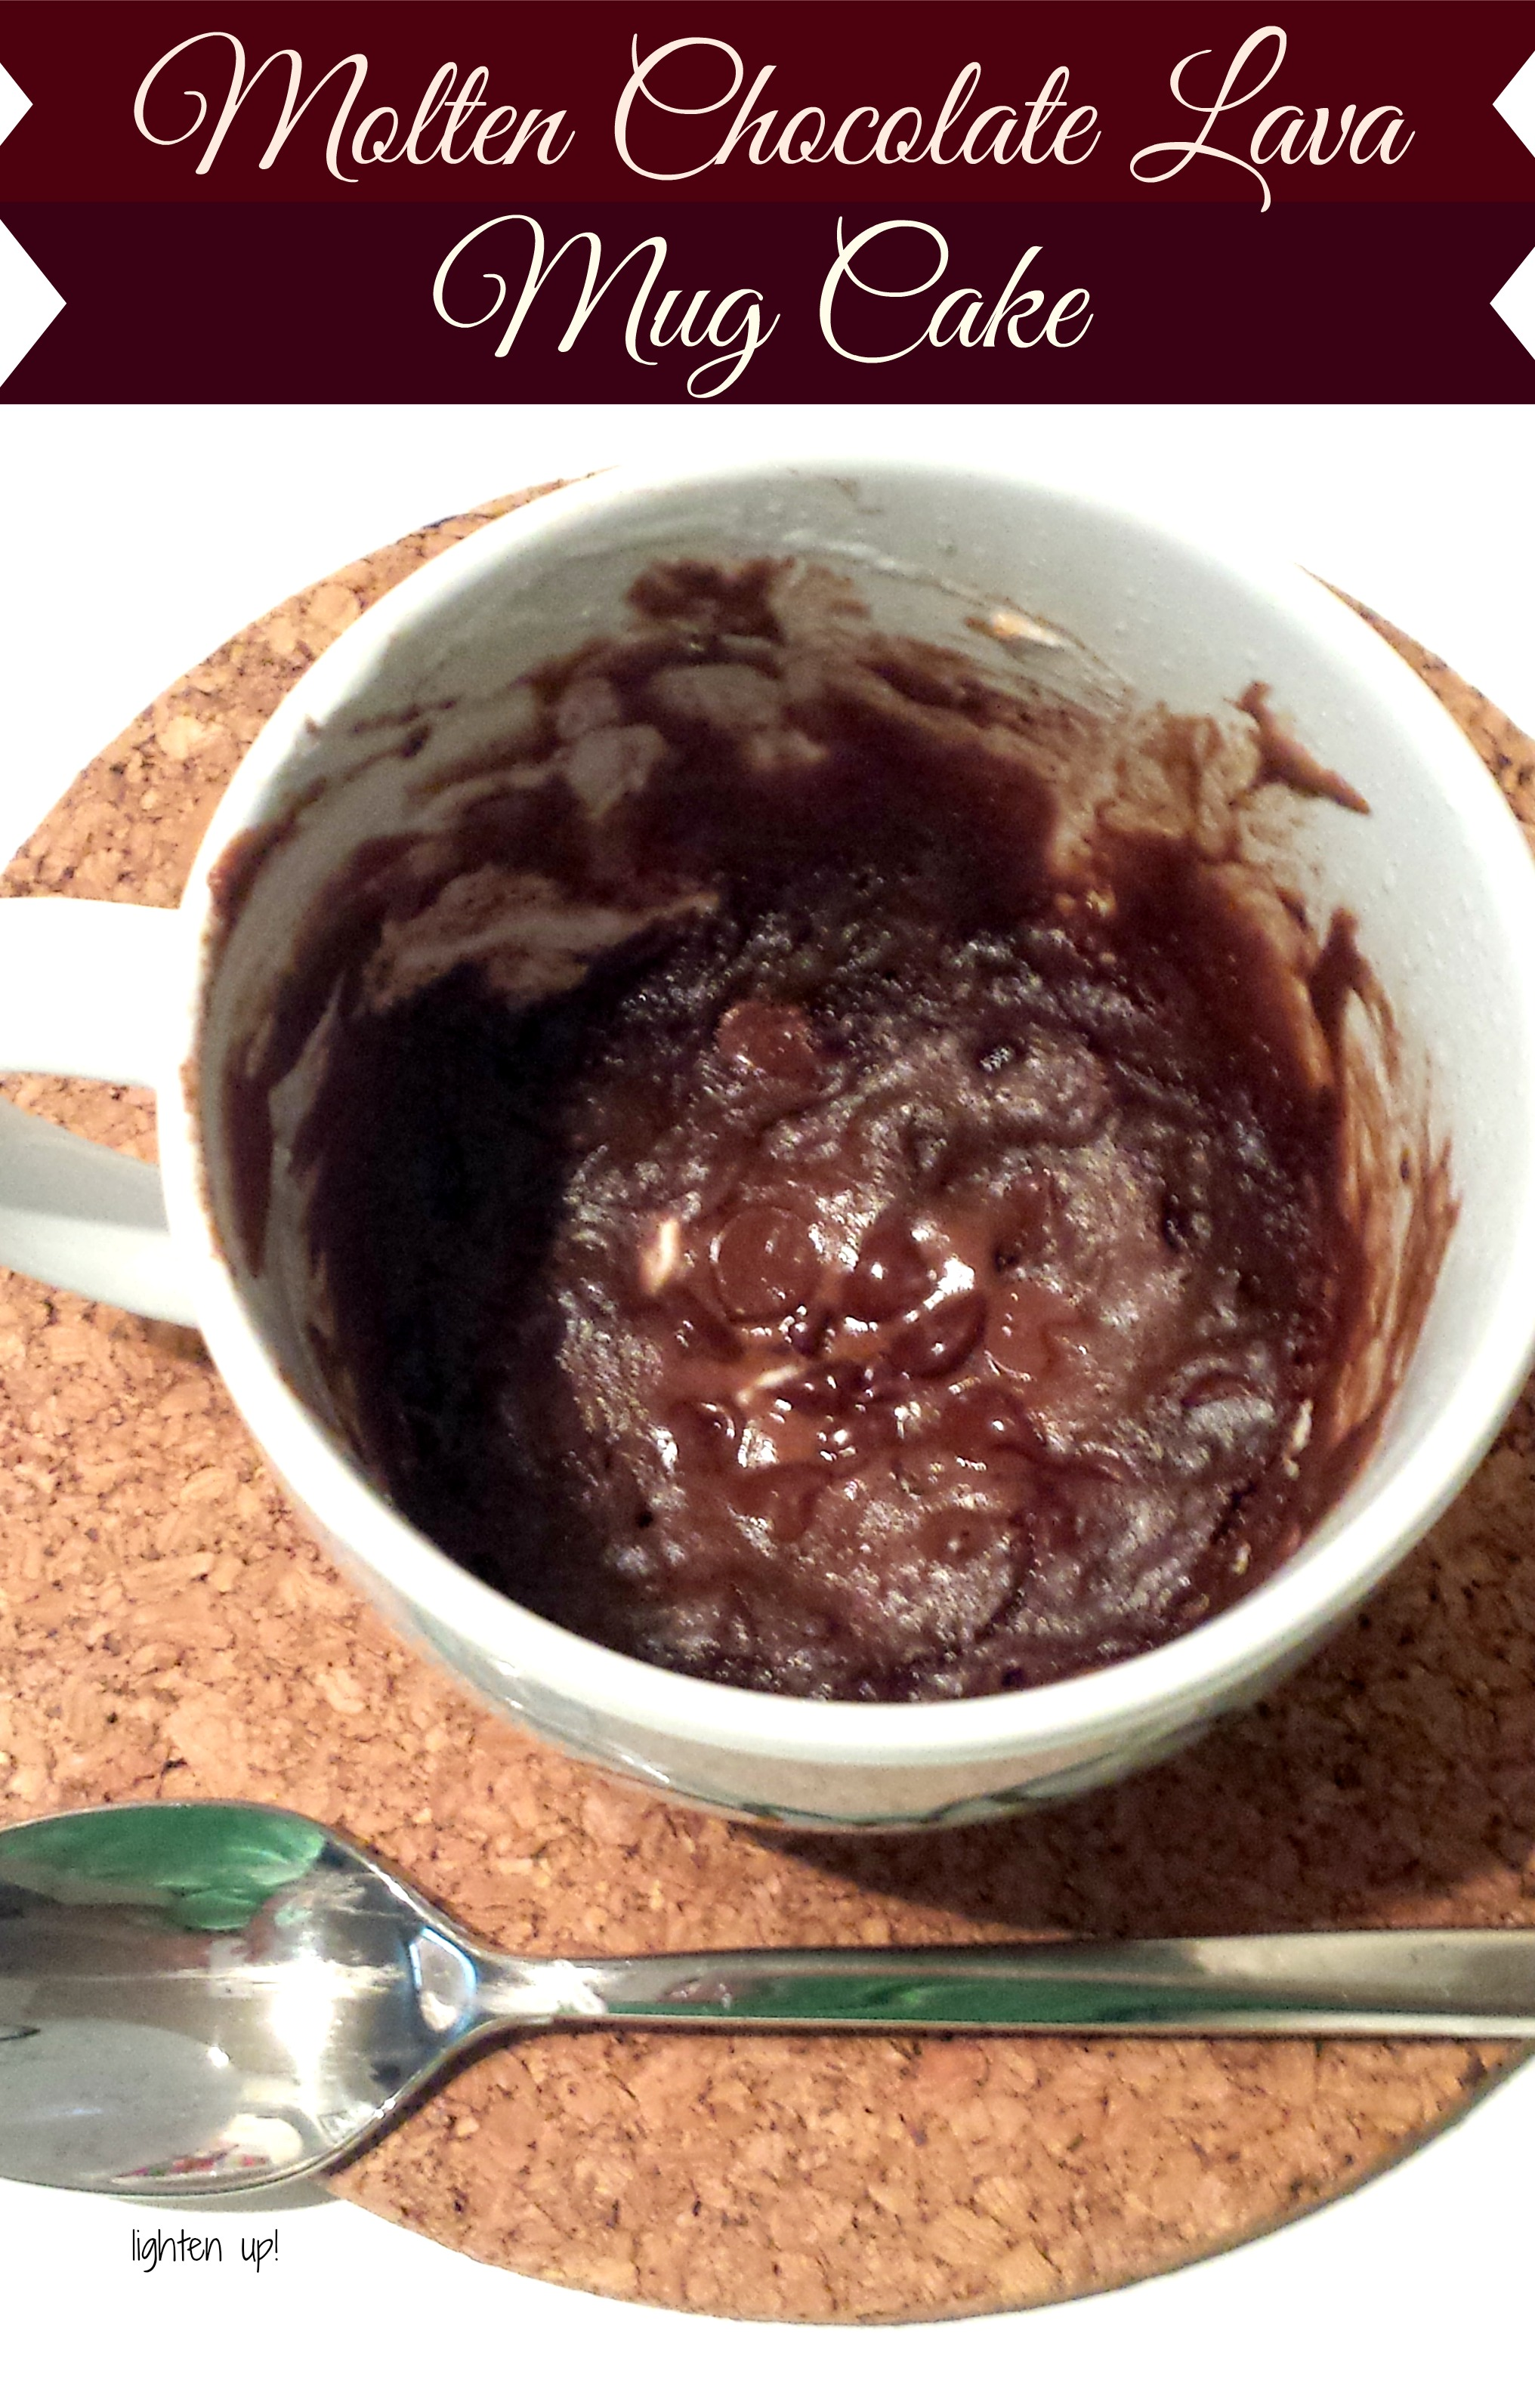 Molten Chocolate Lava Mug Cake | Lighten Up!